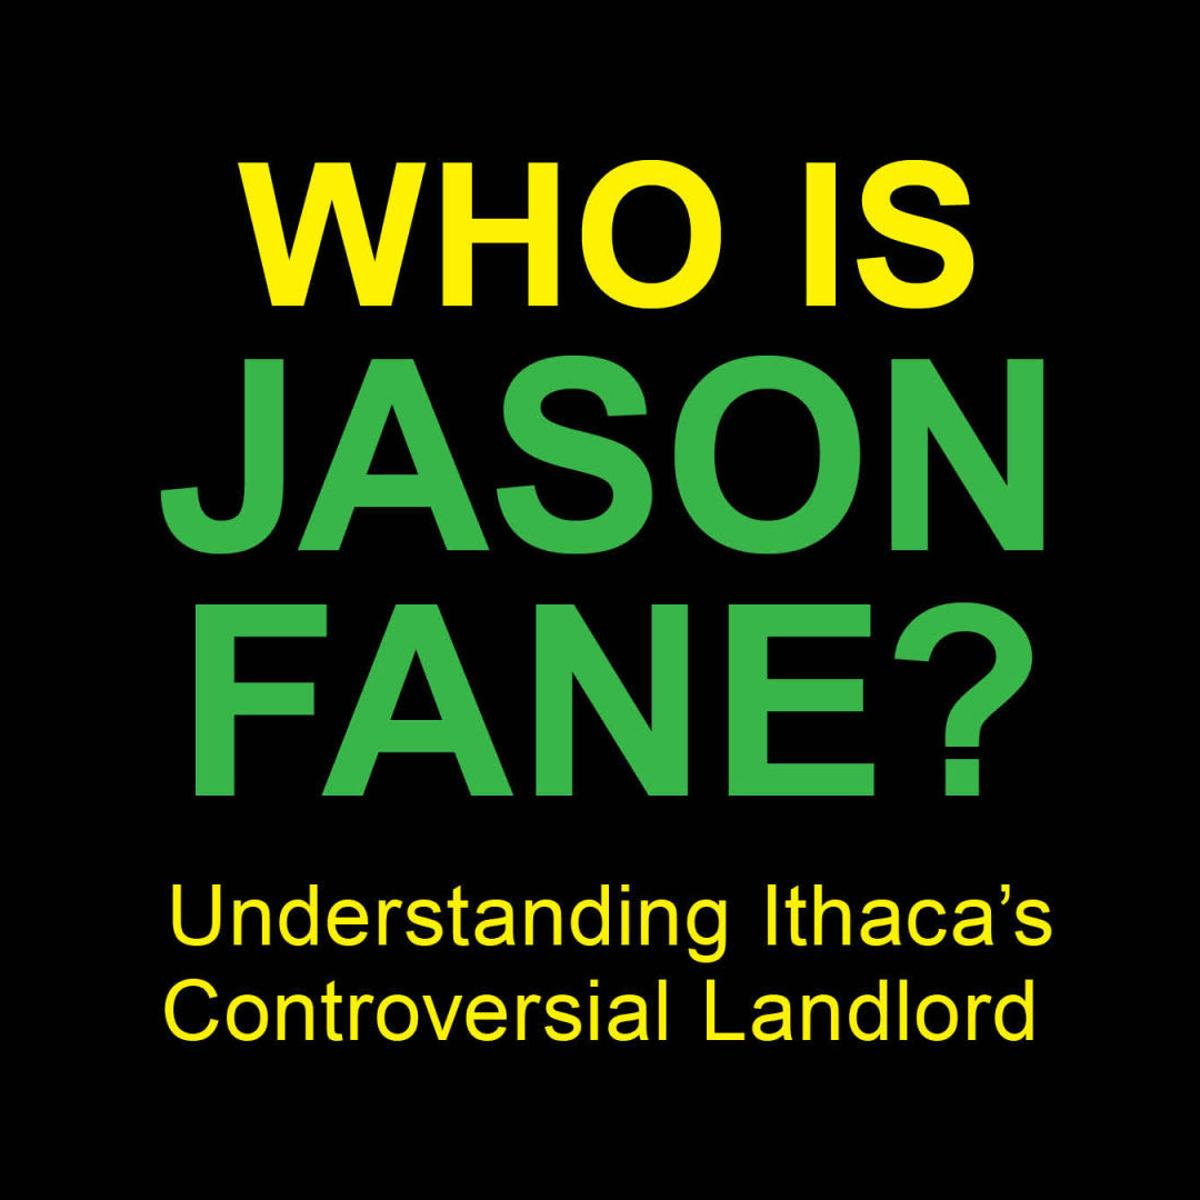 You don't know Jason Fane | Ithaca | ithaca com